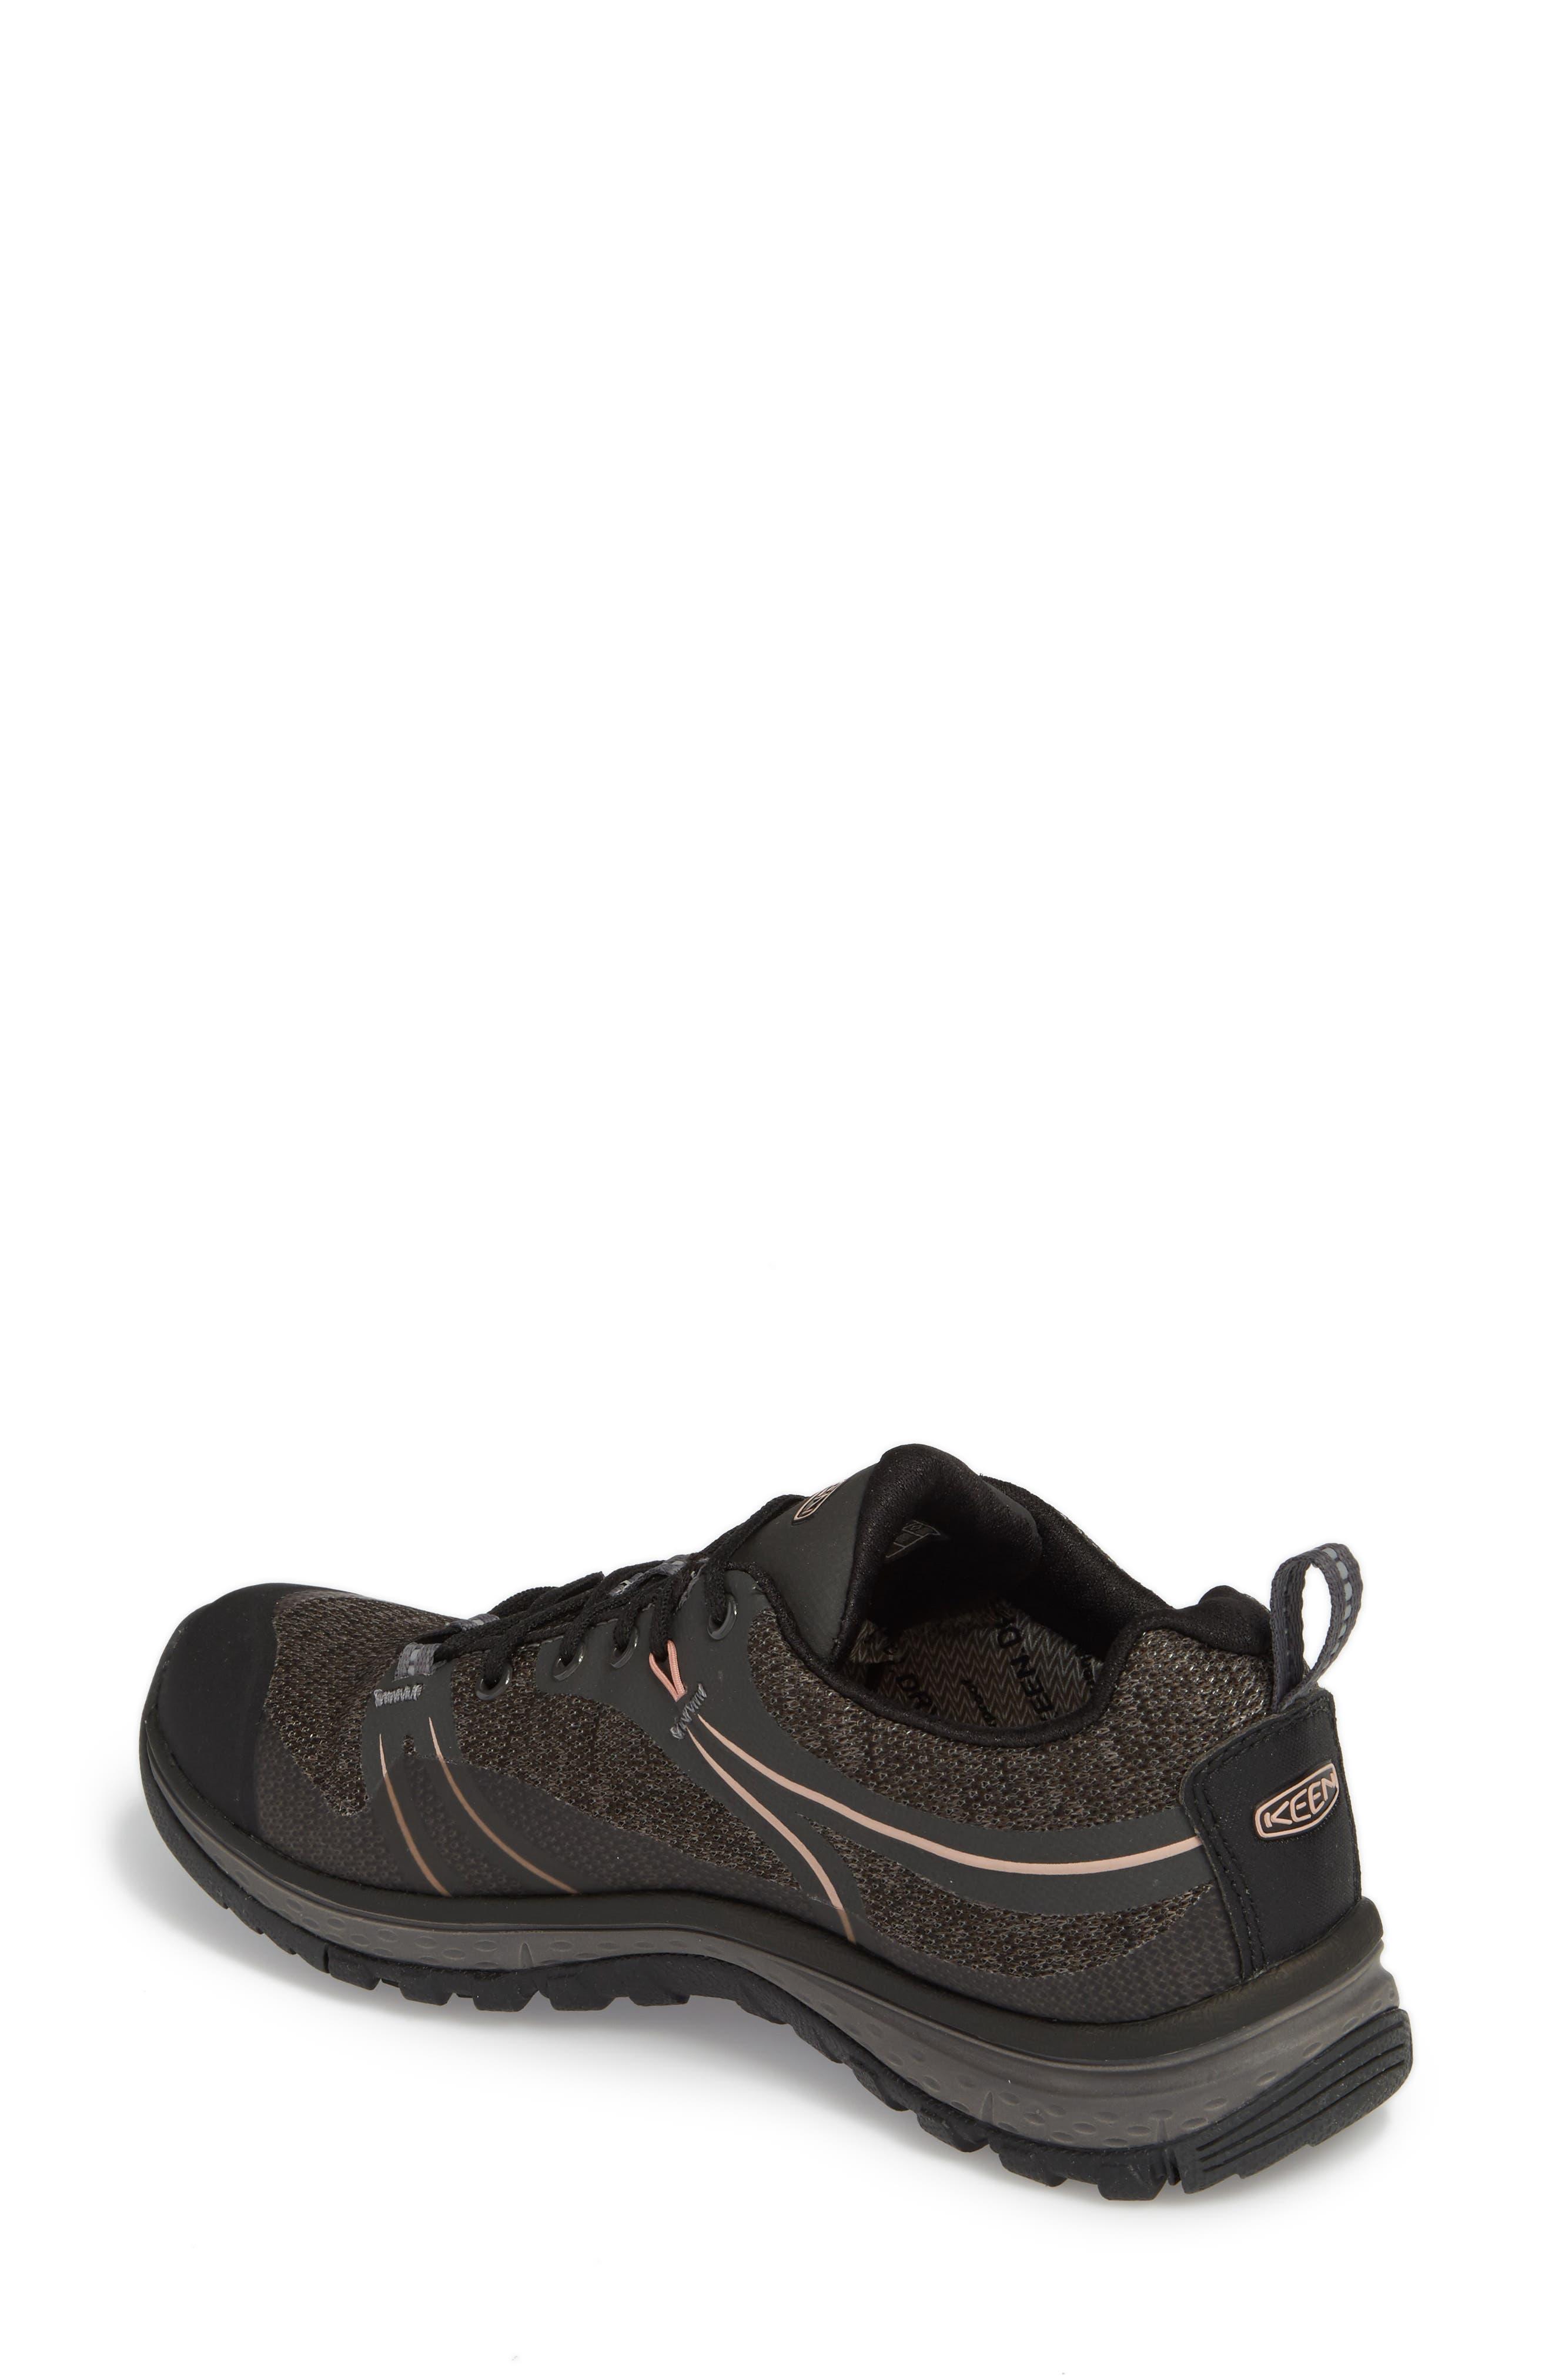 Terradora Waterproof Hiking Shoe,                             Alternate thumbnail 2, color,                             RAVEN/ ROSE DAWN